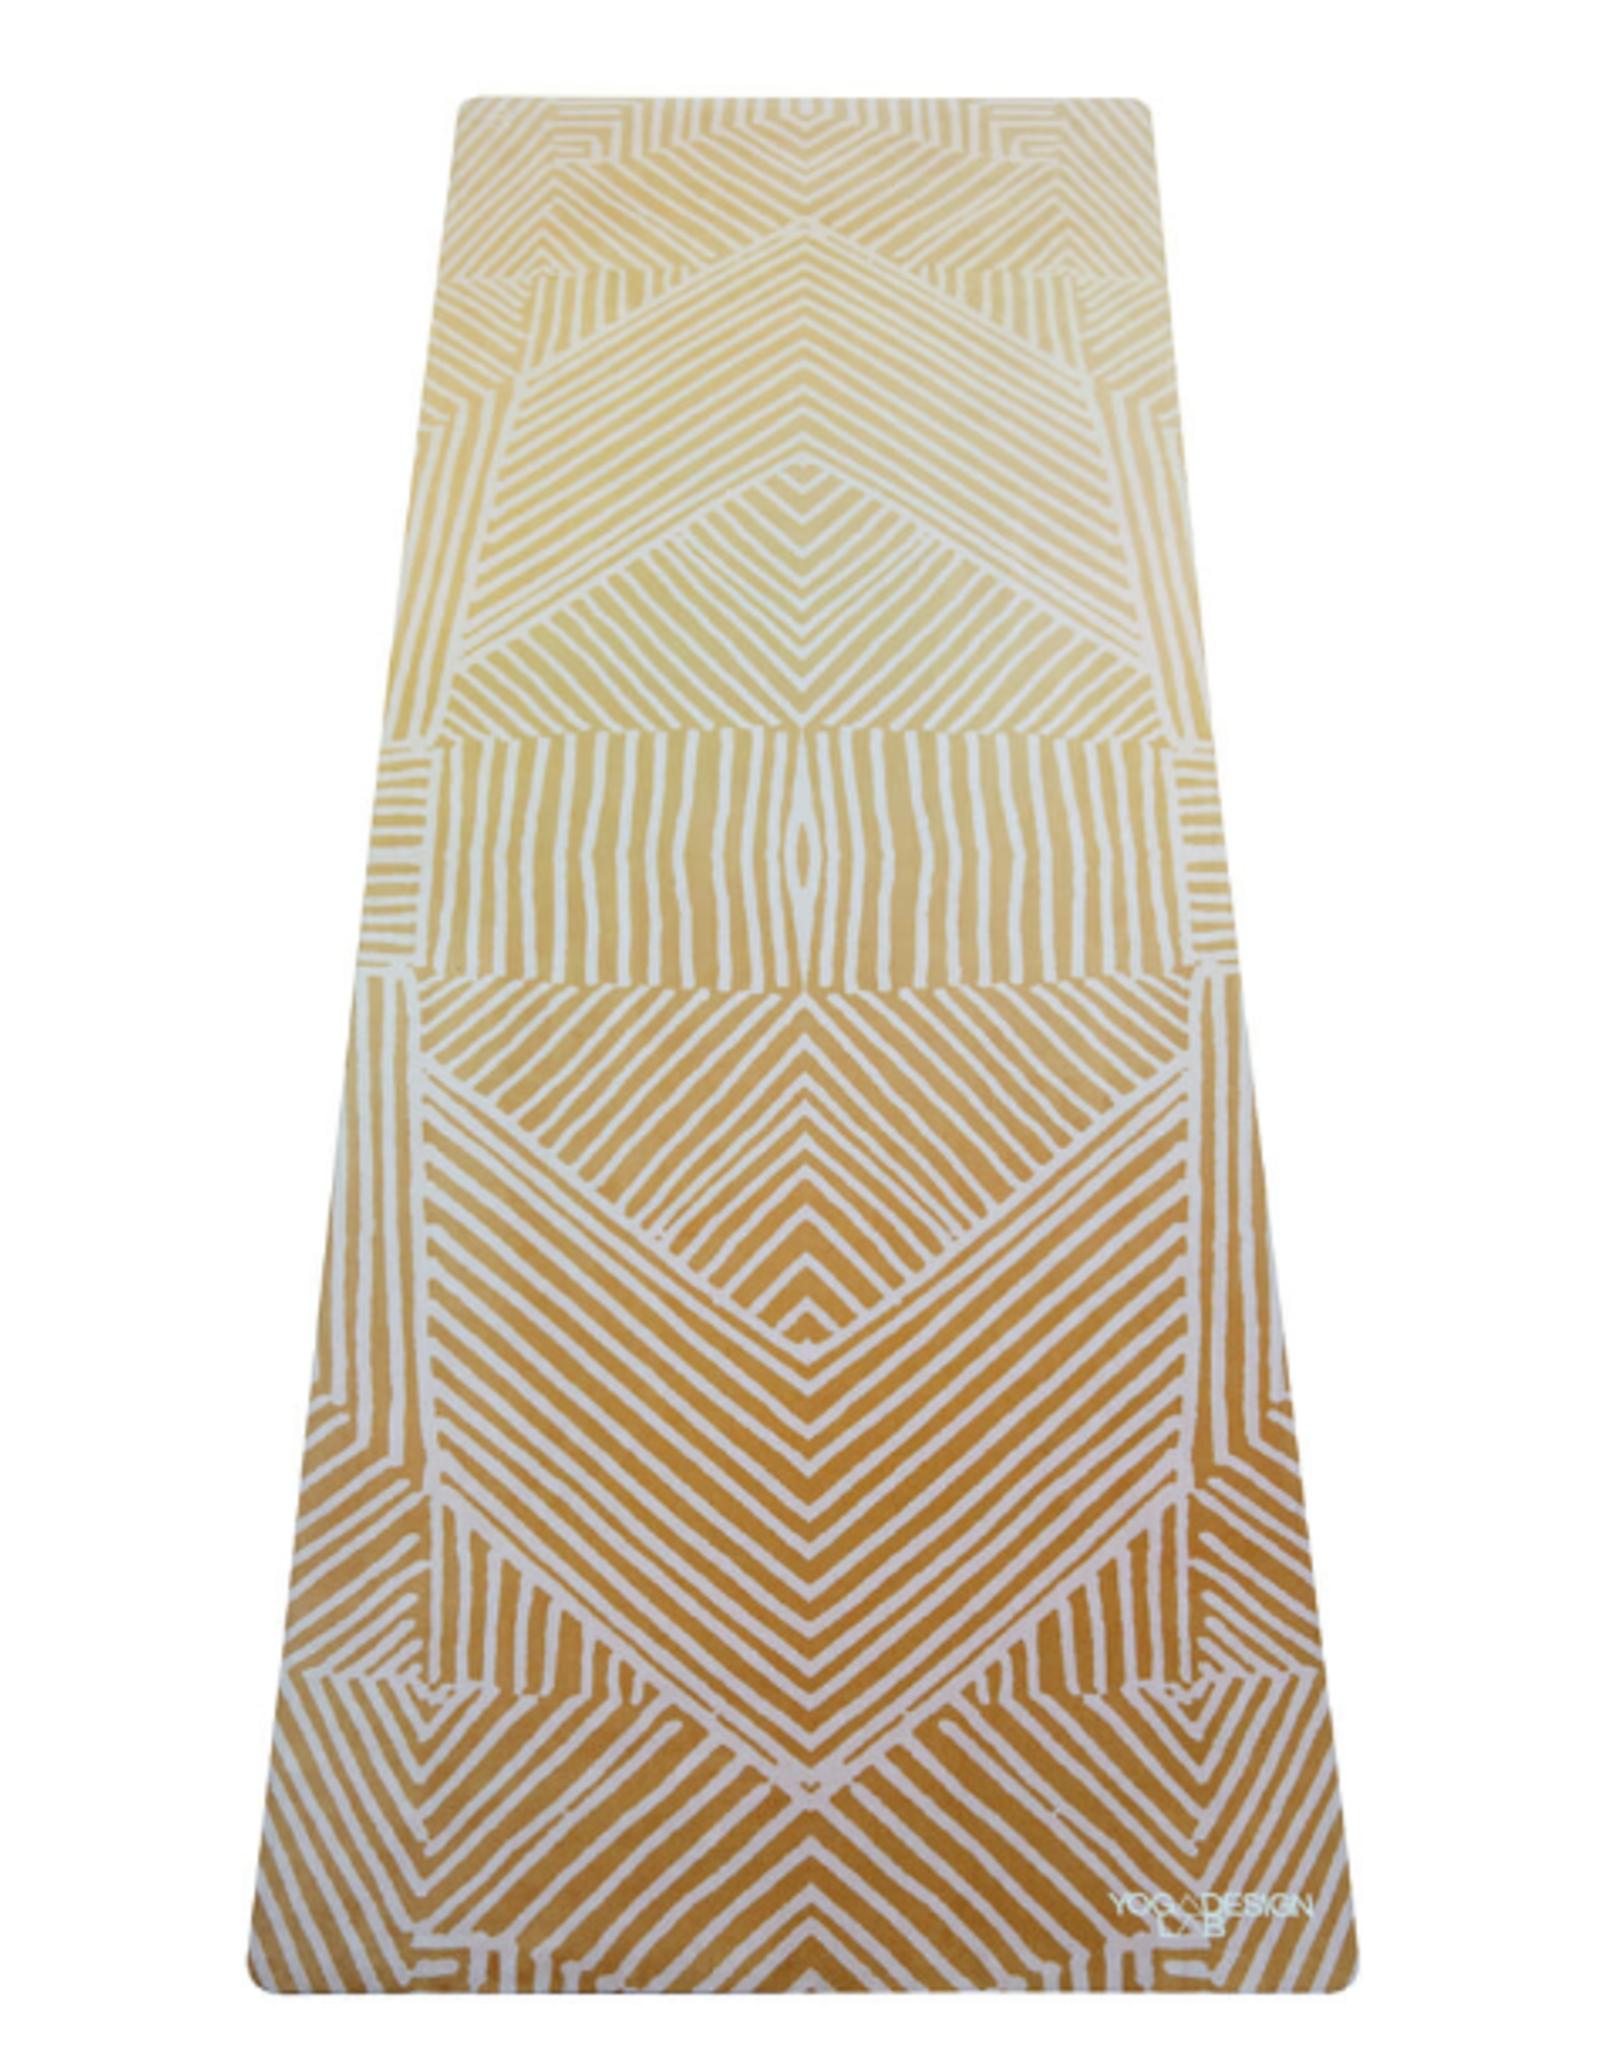 Yoga Design Lab Combo Mat - 3.5mm - Optical Gold